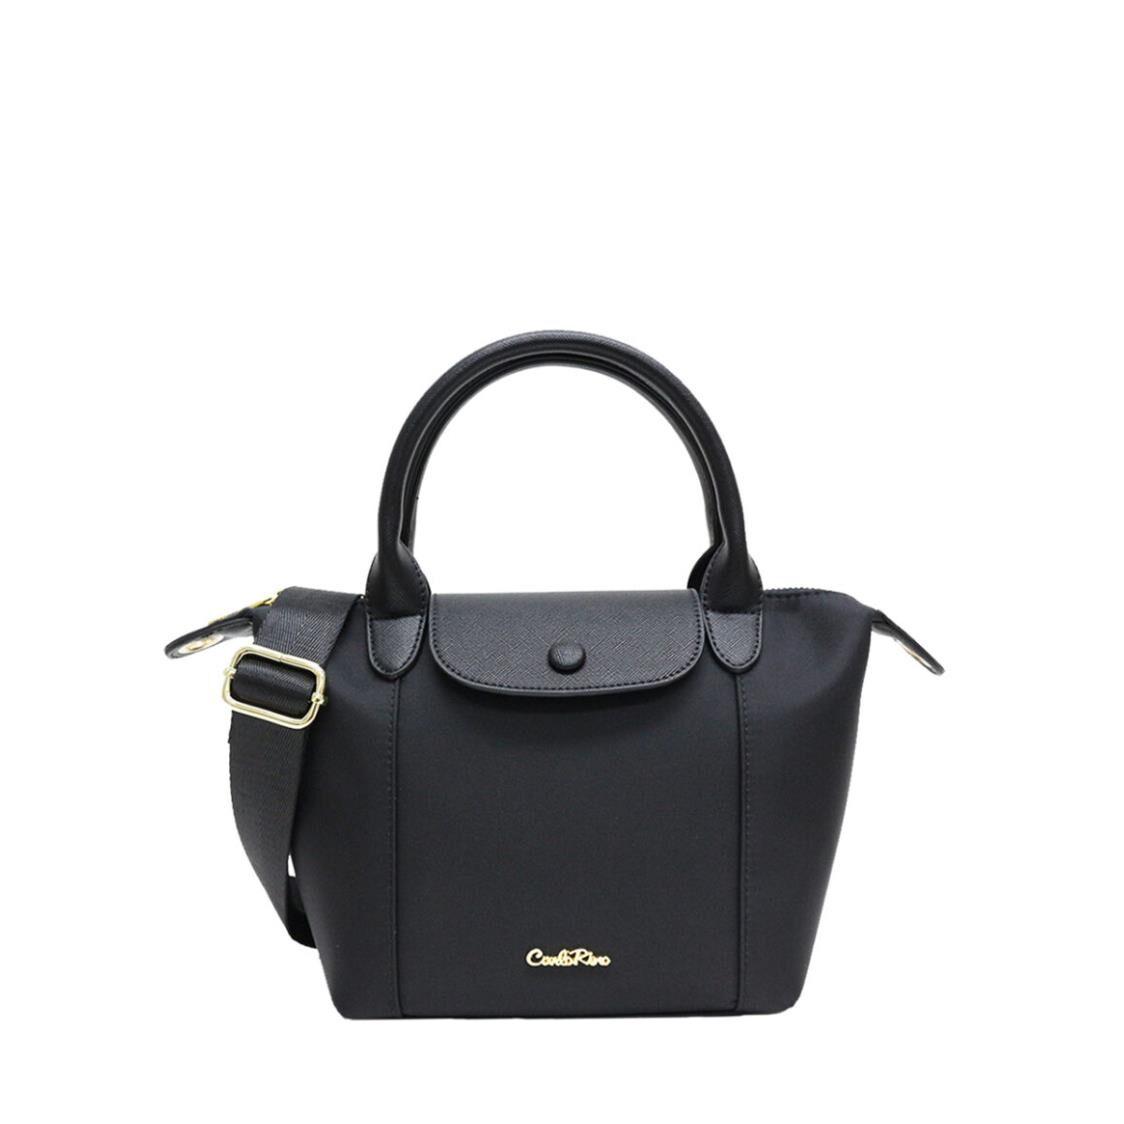 Carlo Rino Shoulder Bag Black 34898-001-08